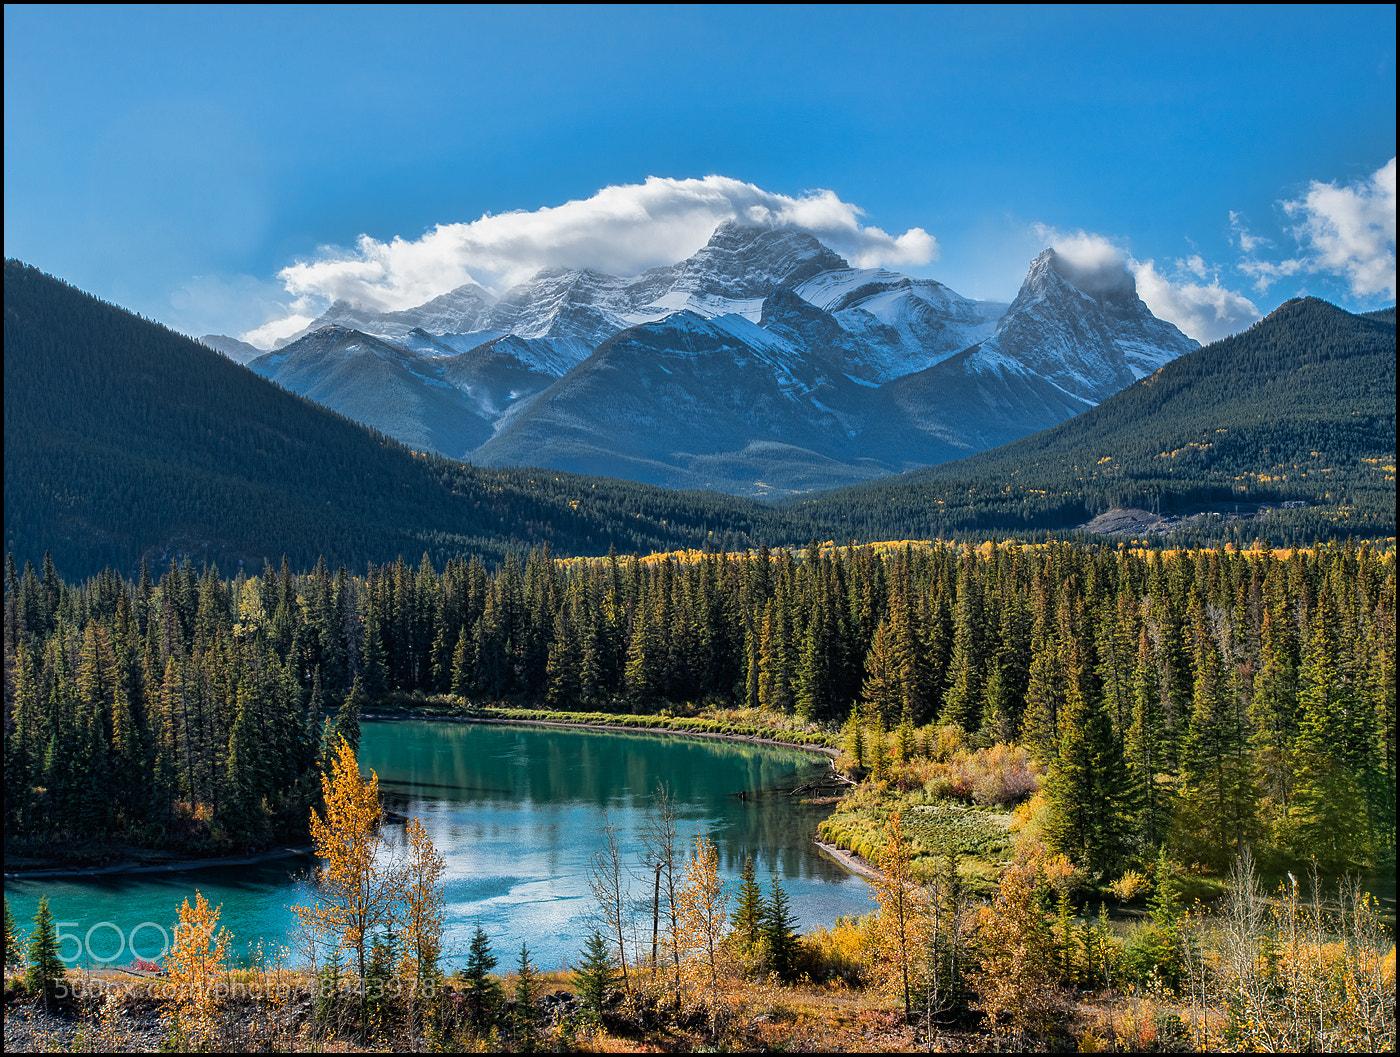 Photograph Canadian Rocky Mountains by Alex Gubski on 500px